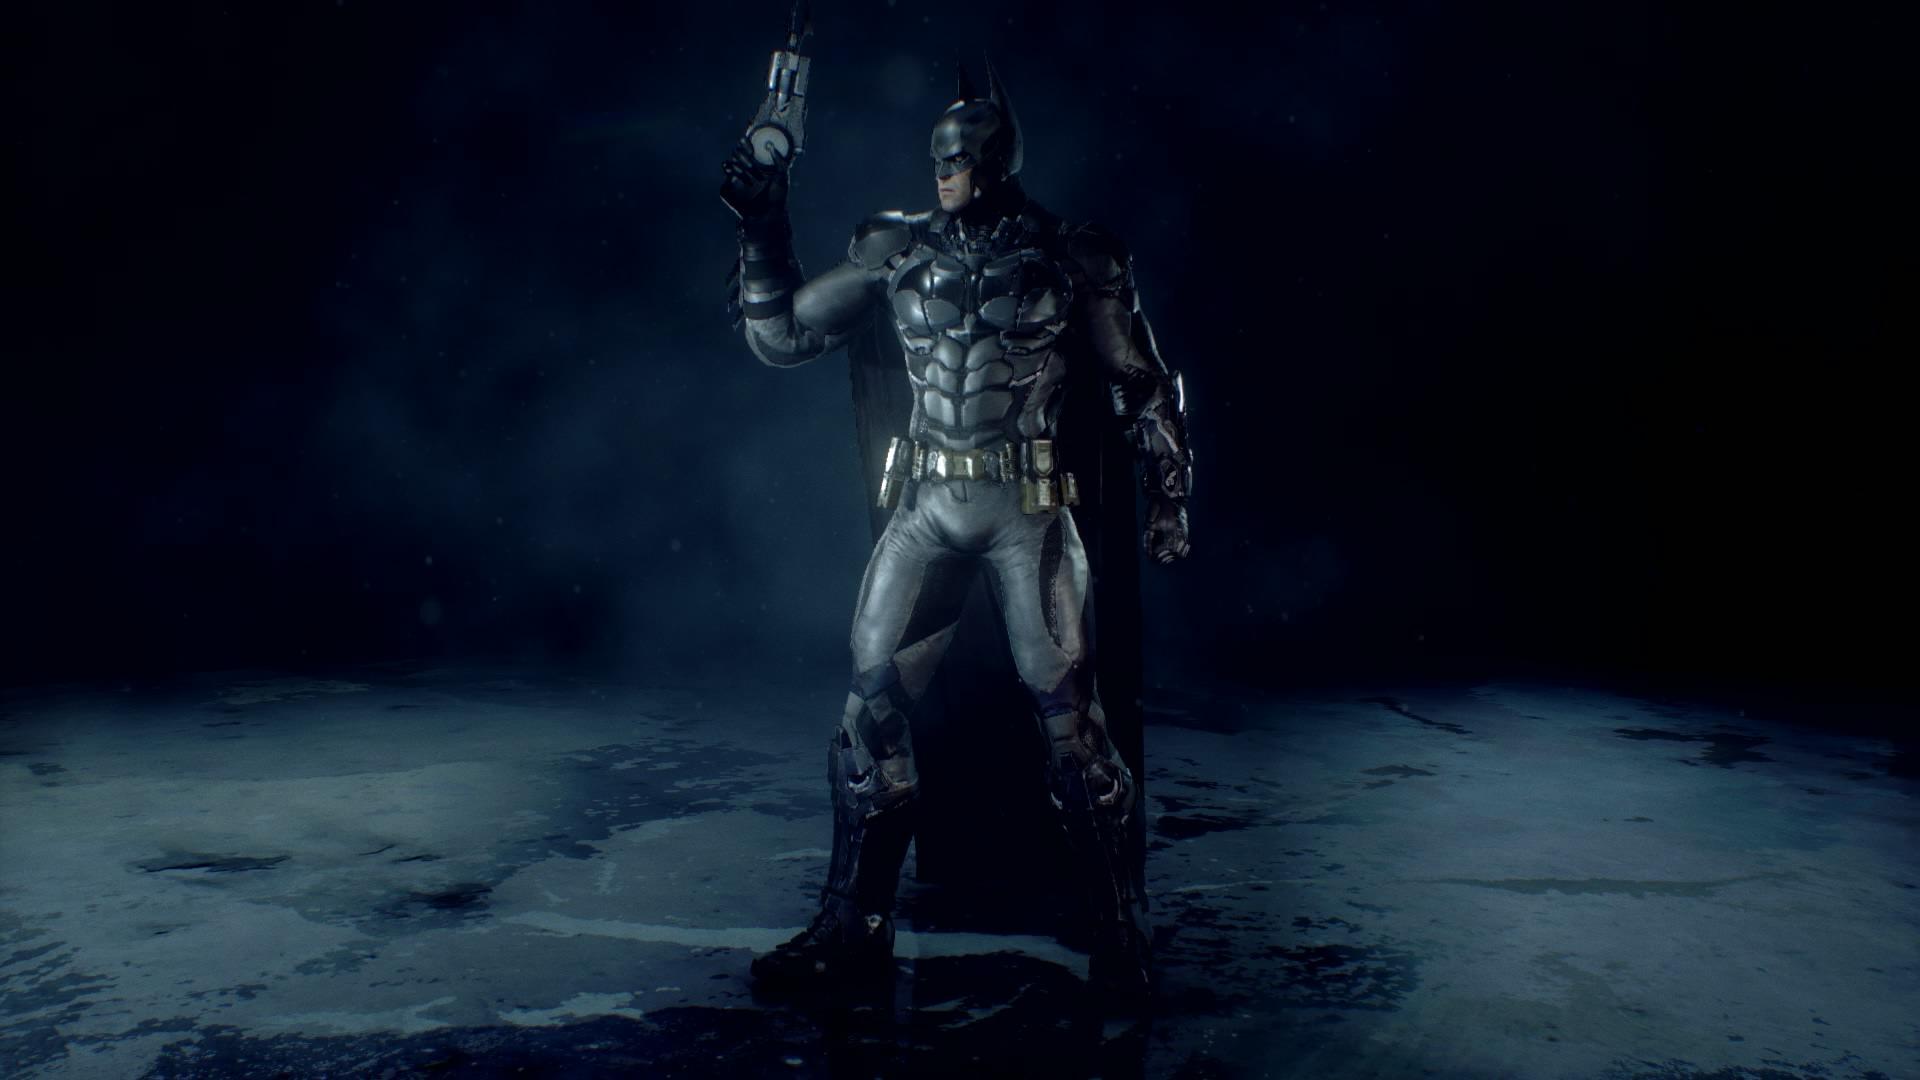 Recenze: Batman Arkham Knight – Strach nad Gothamem 10721